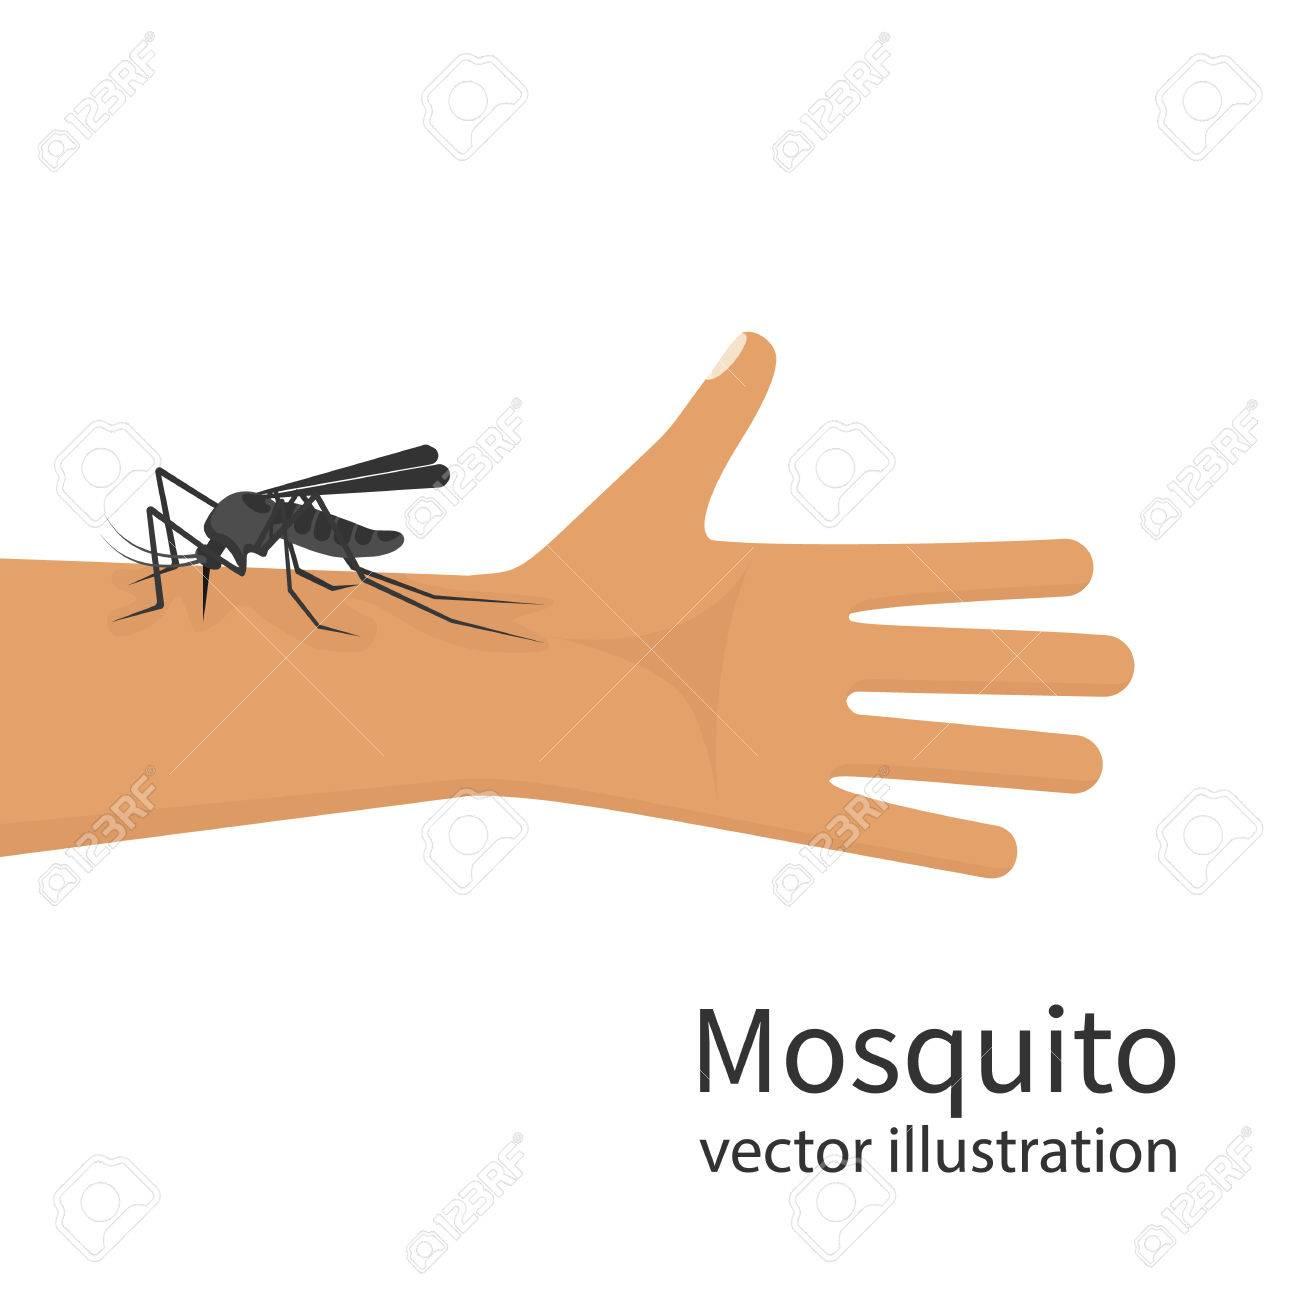 Mosquito bite on skin hand human vector.